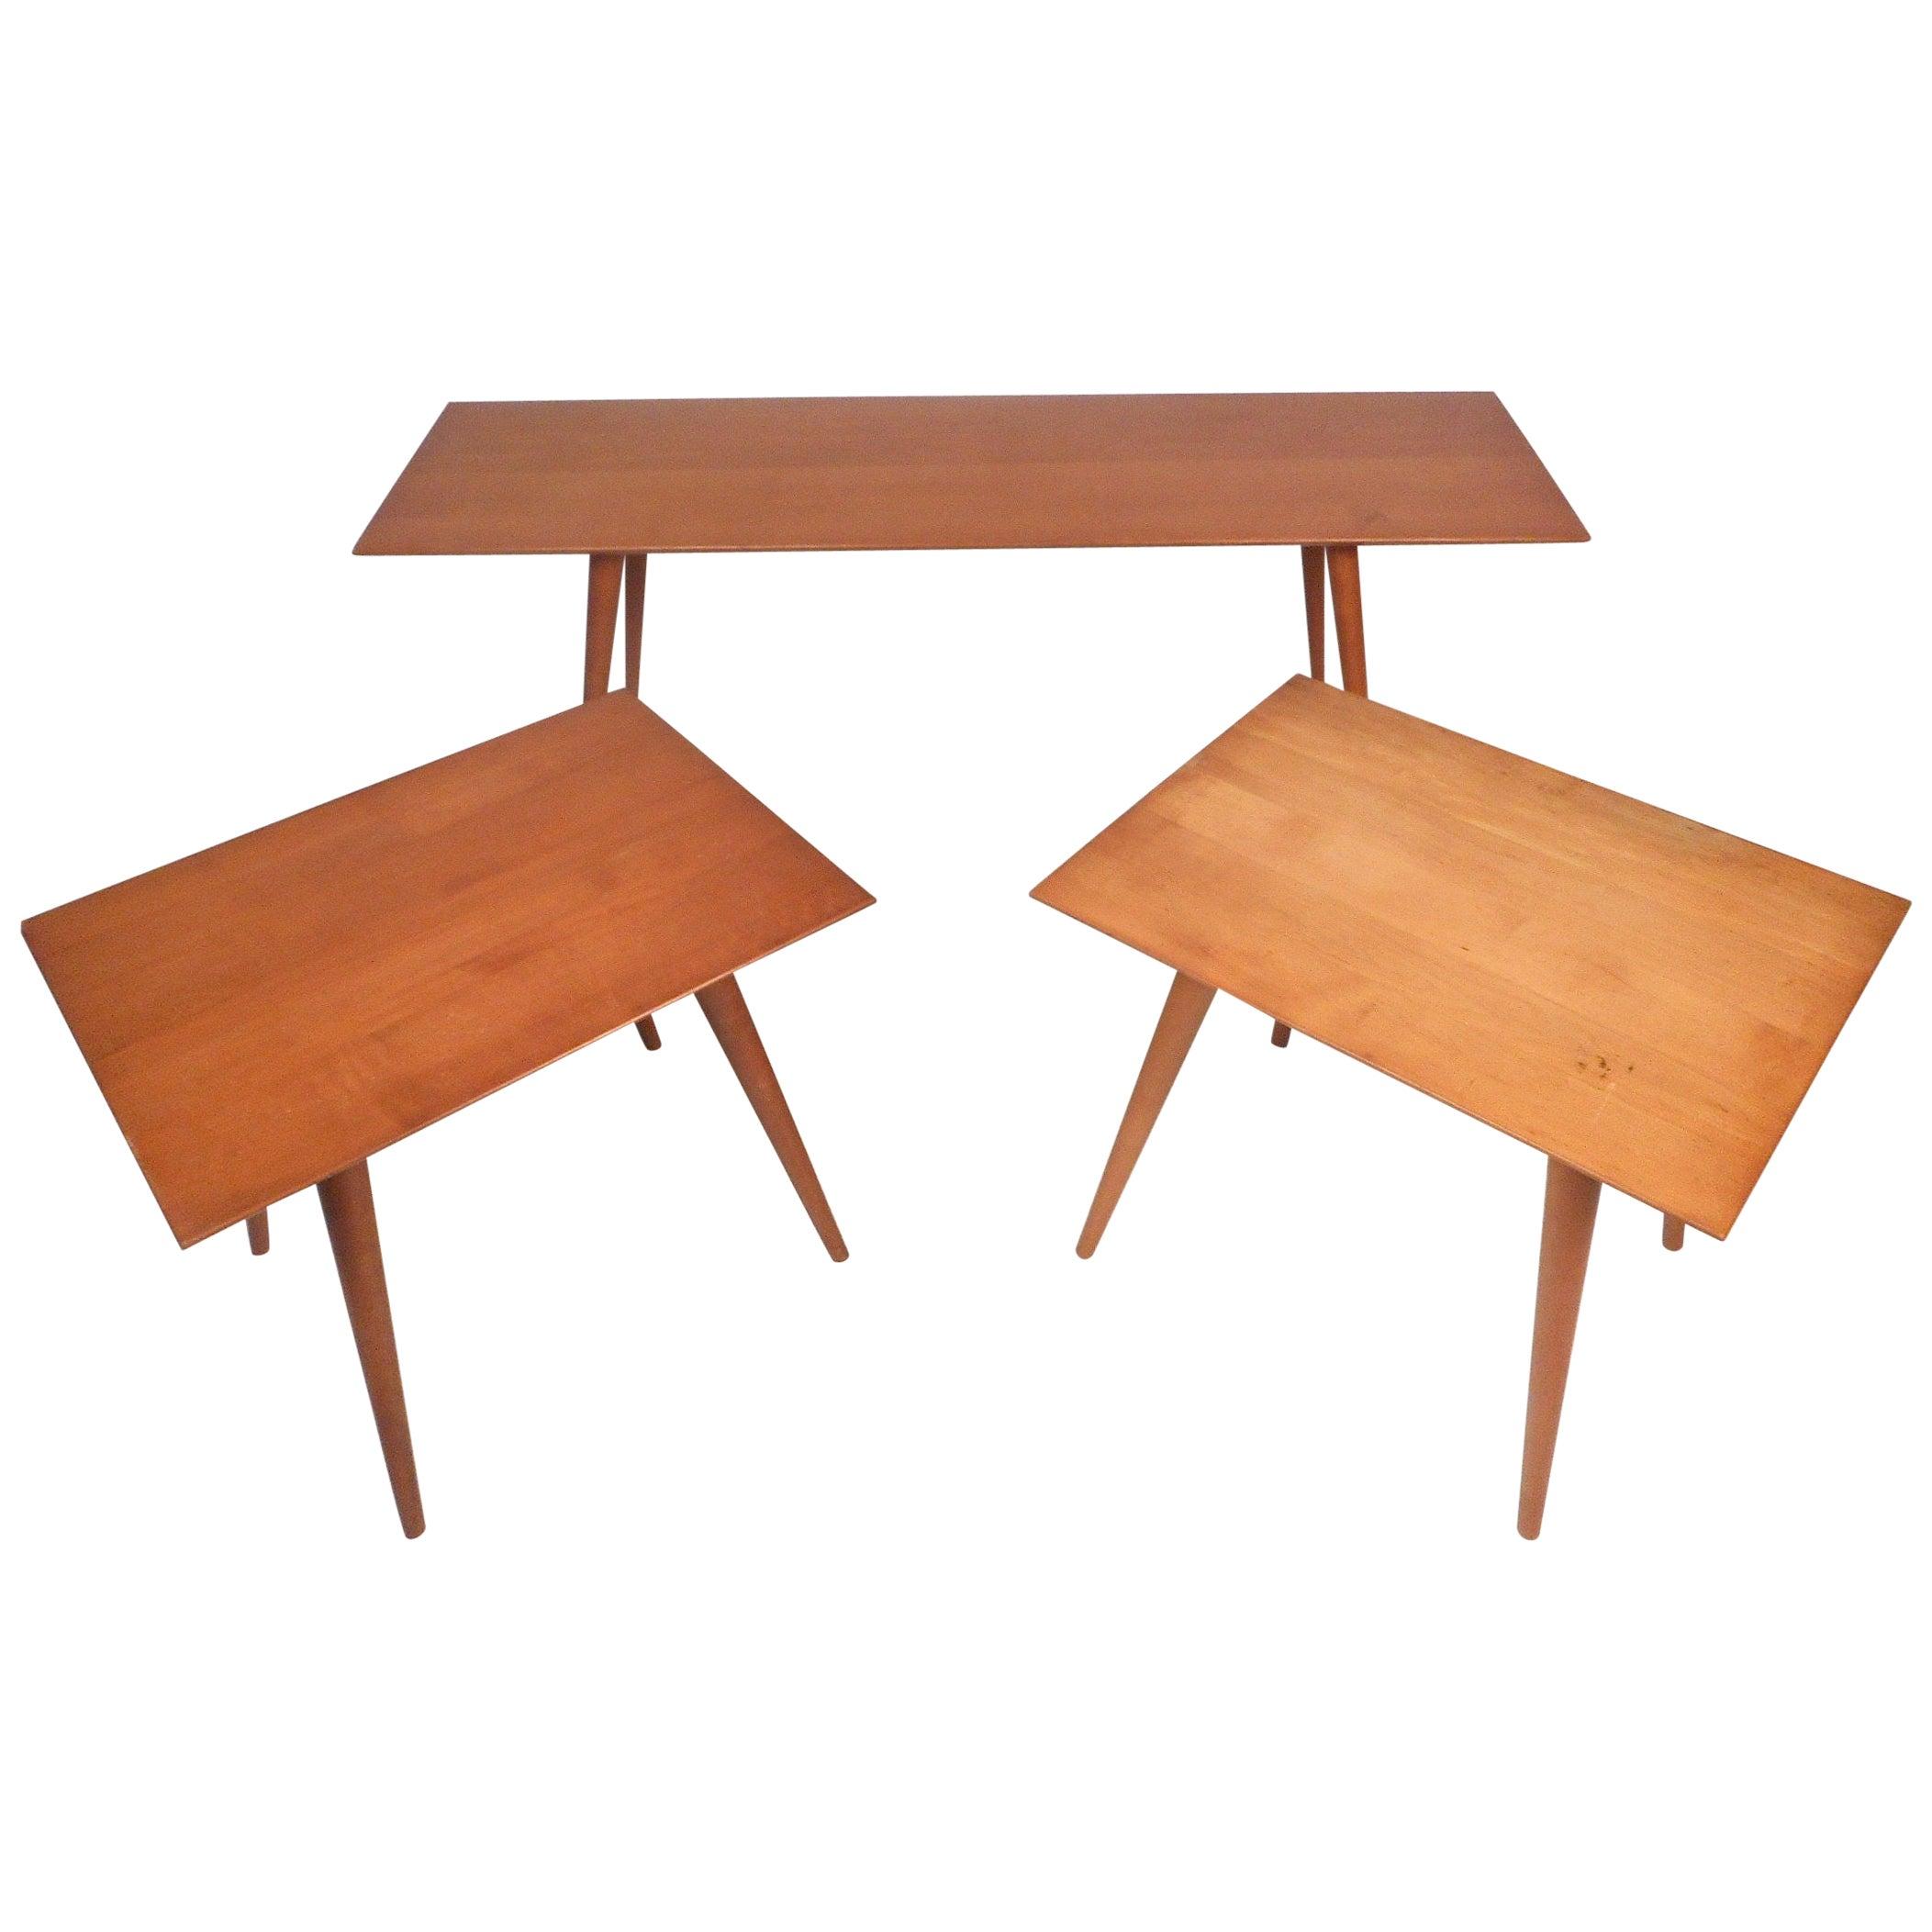 Midcentury Coffee Table Set by Paul McCobb